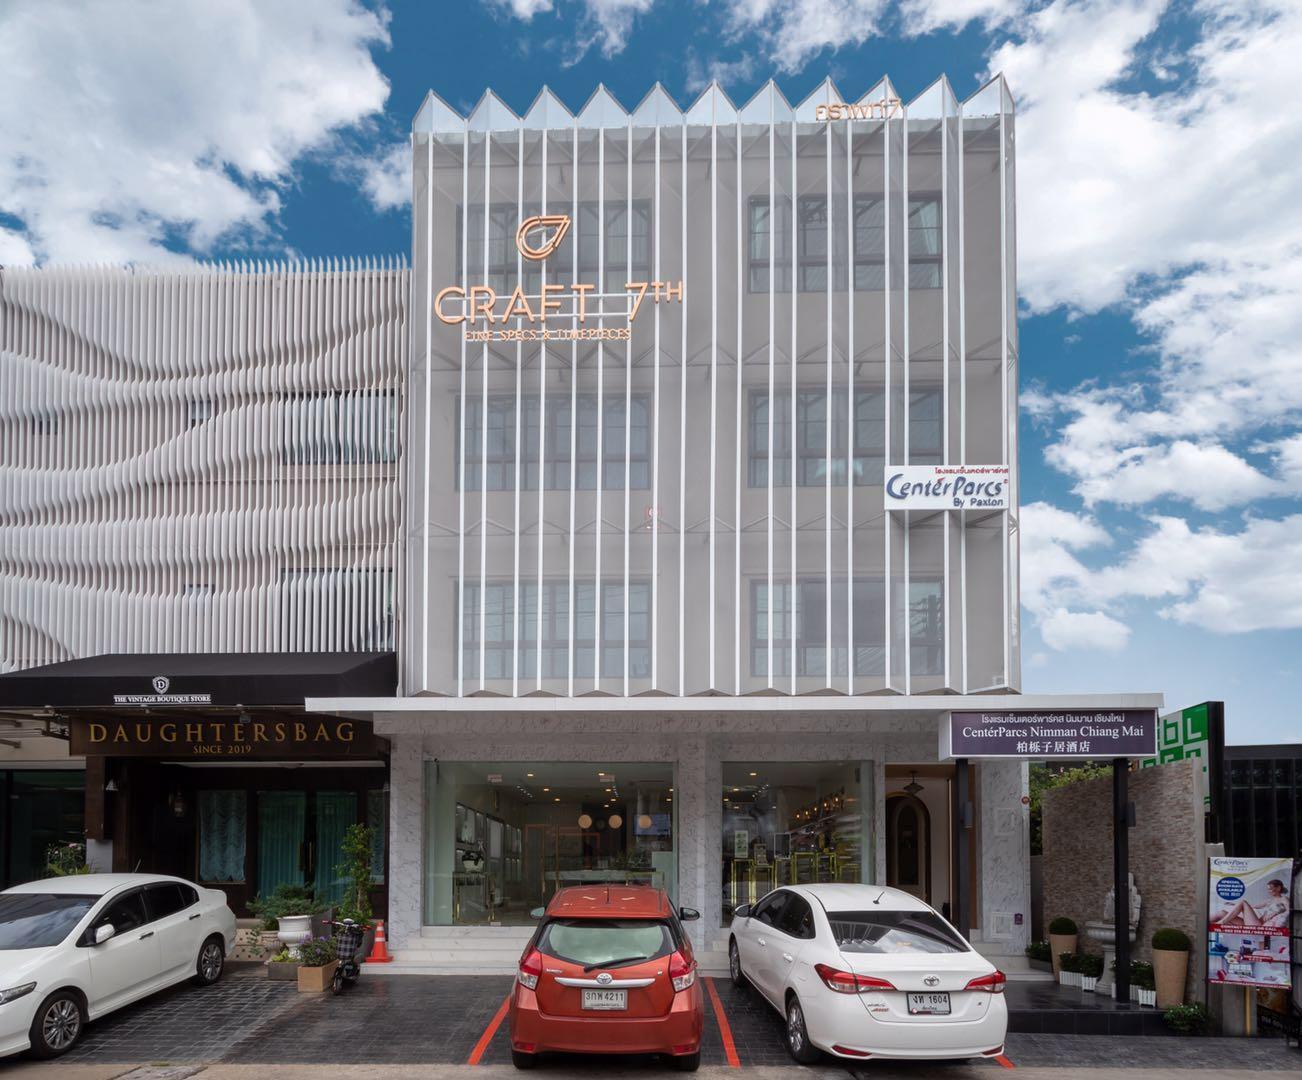 CenterParcs by Paxton Chiangmai เซ็นเตอร์พาร์ค บาย แพ็กซ์ตัน เชียงใหม่